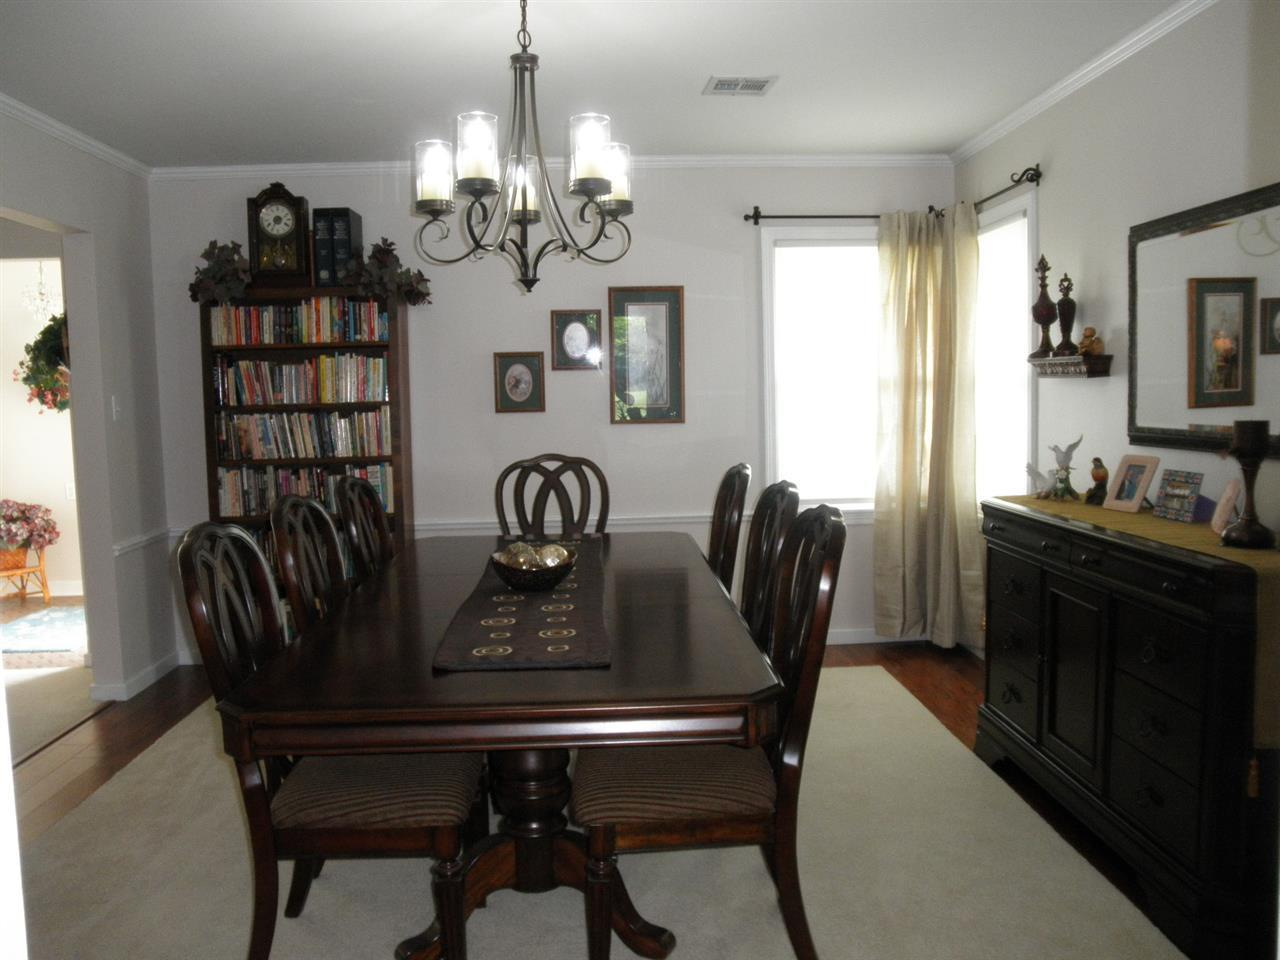 Sold Cross Sale W/ MLS | 127 Fairview  Ponca City, OK 74601 8